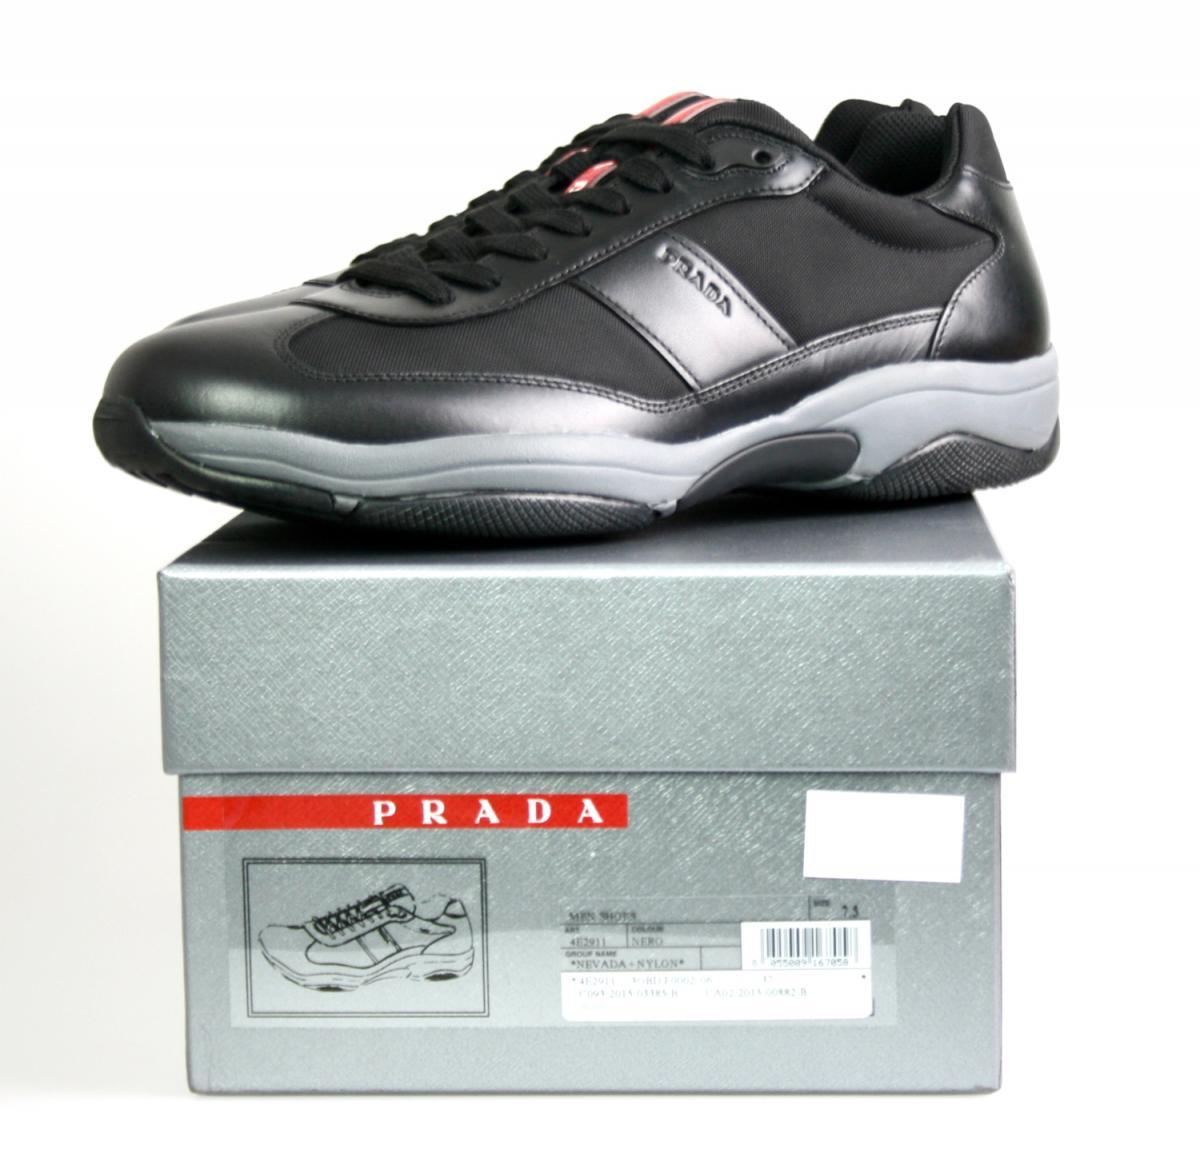 luxus prada sneaker americas cup schuhe 4e2911 schwarz neu new 8 42 42 5 ebay. Black Bedroom Furniture Sets. Home Design Ideas